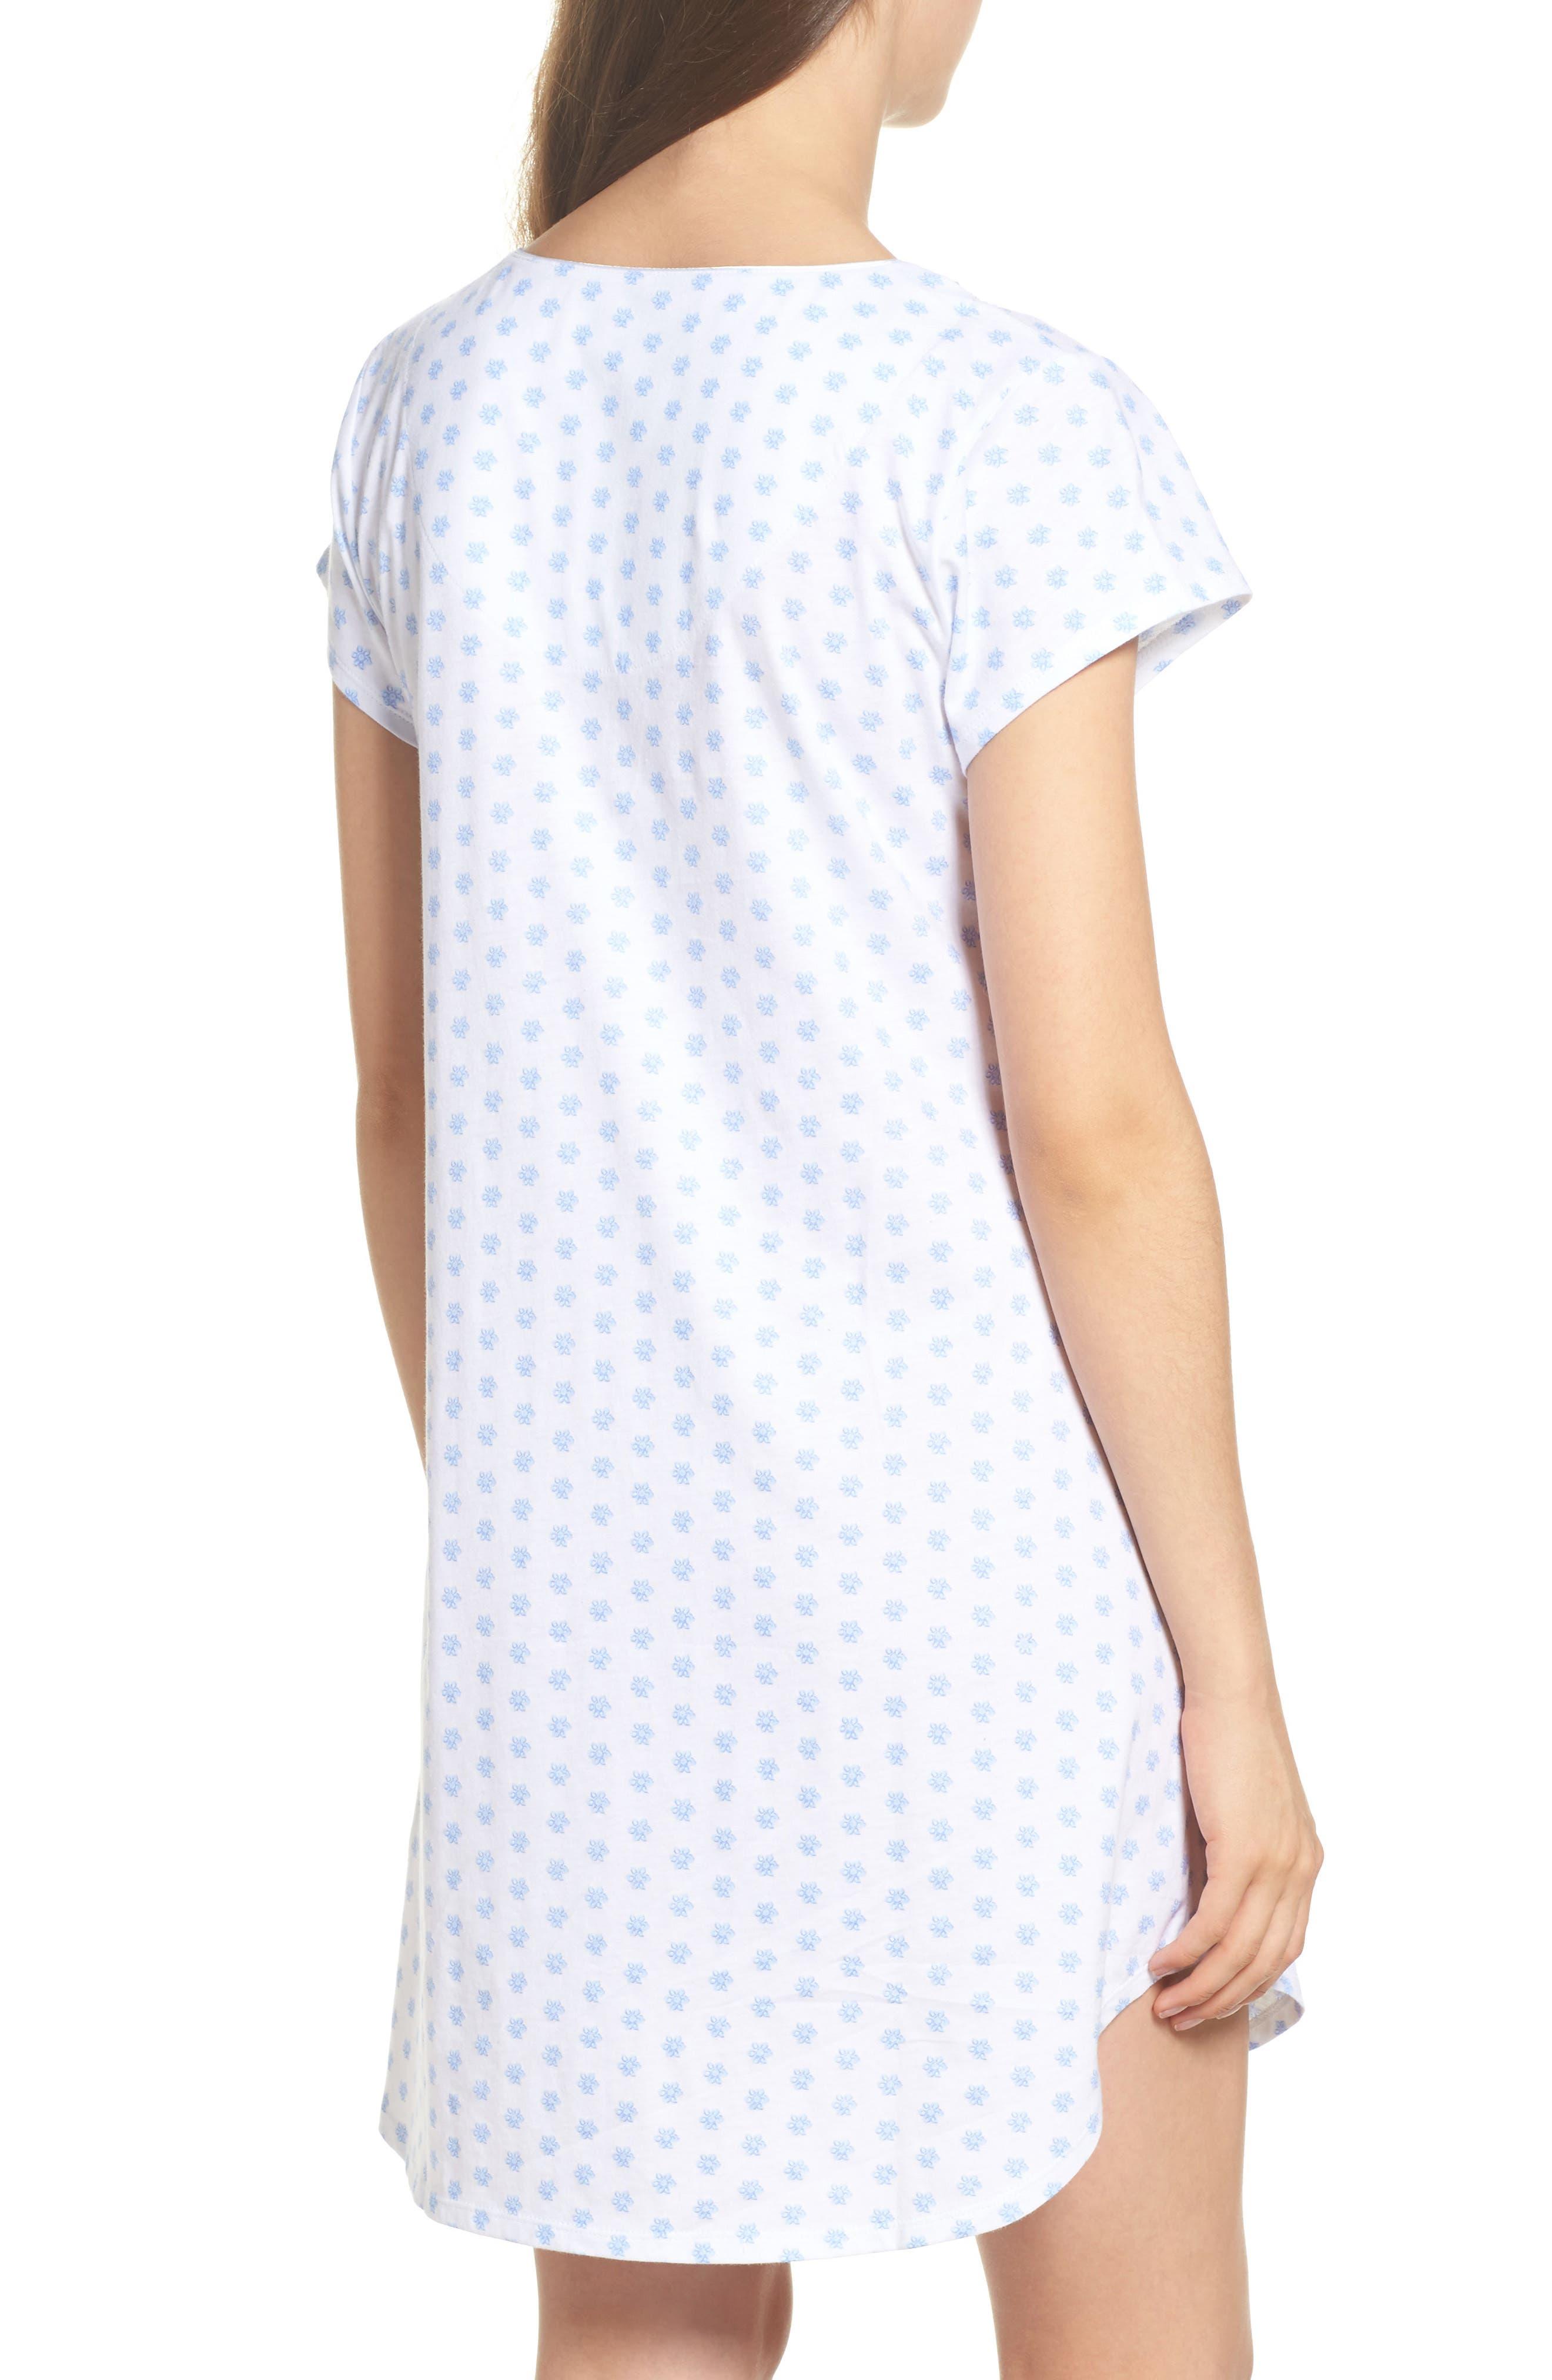 Jersey Sleep Shirt,                             Alternate thumbnail 2, color,